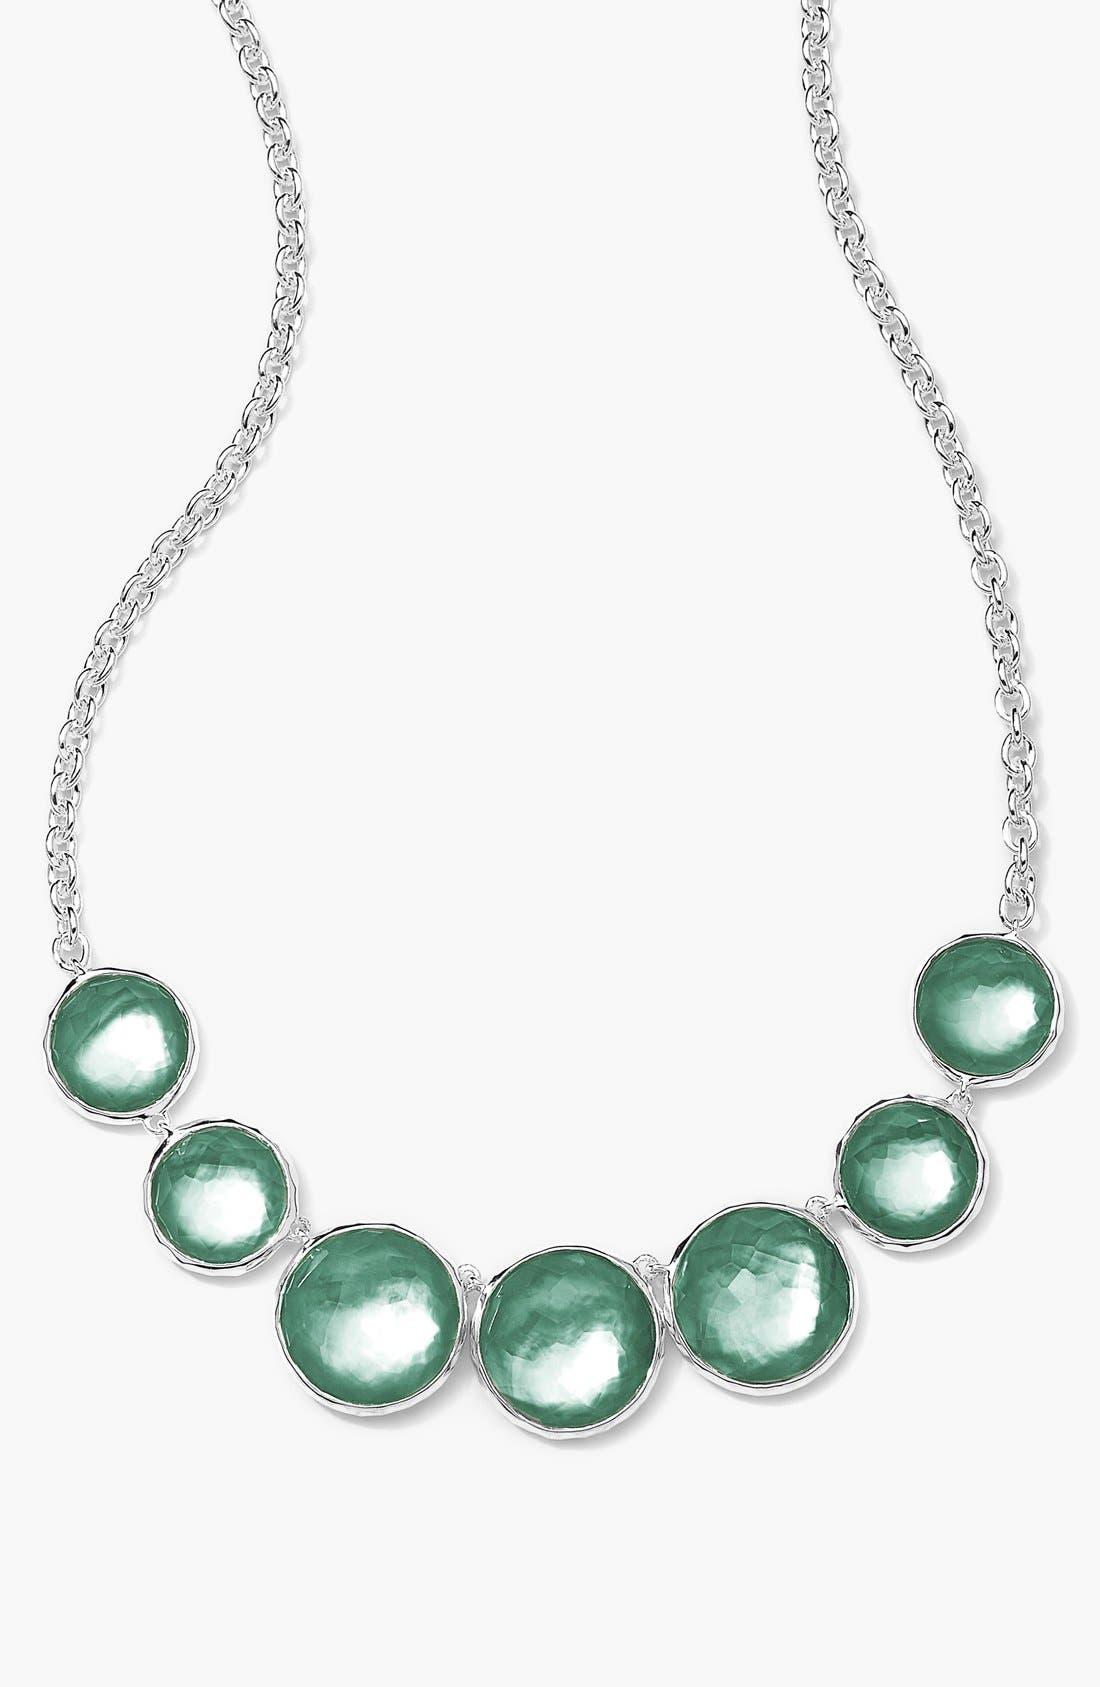 Main Image - Ippolita 'Wonderland - Lollipop' Frontal Necklace